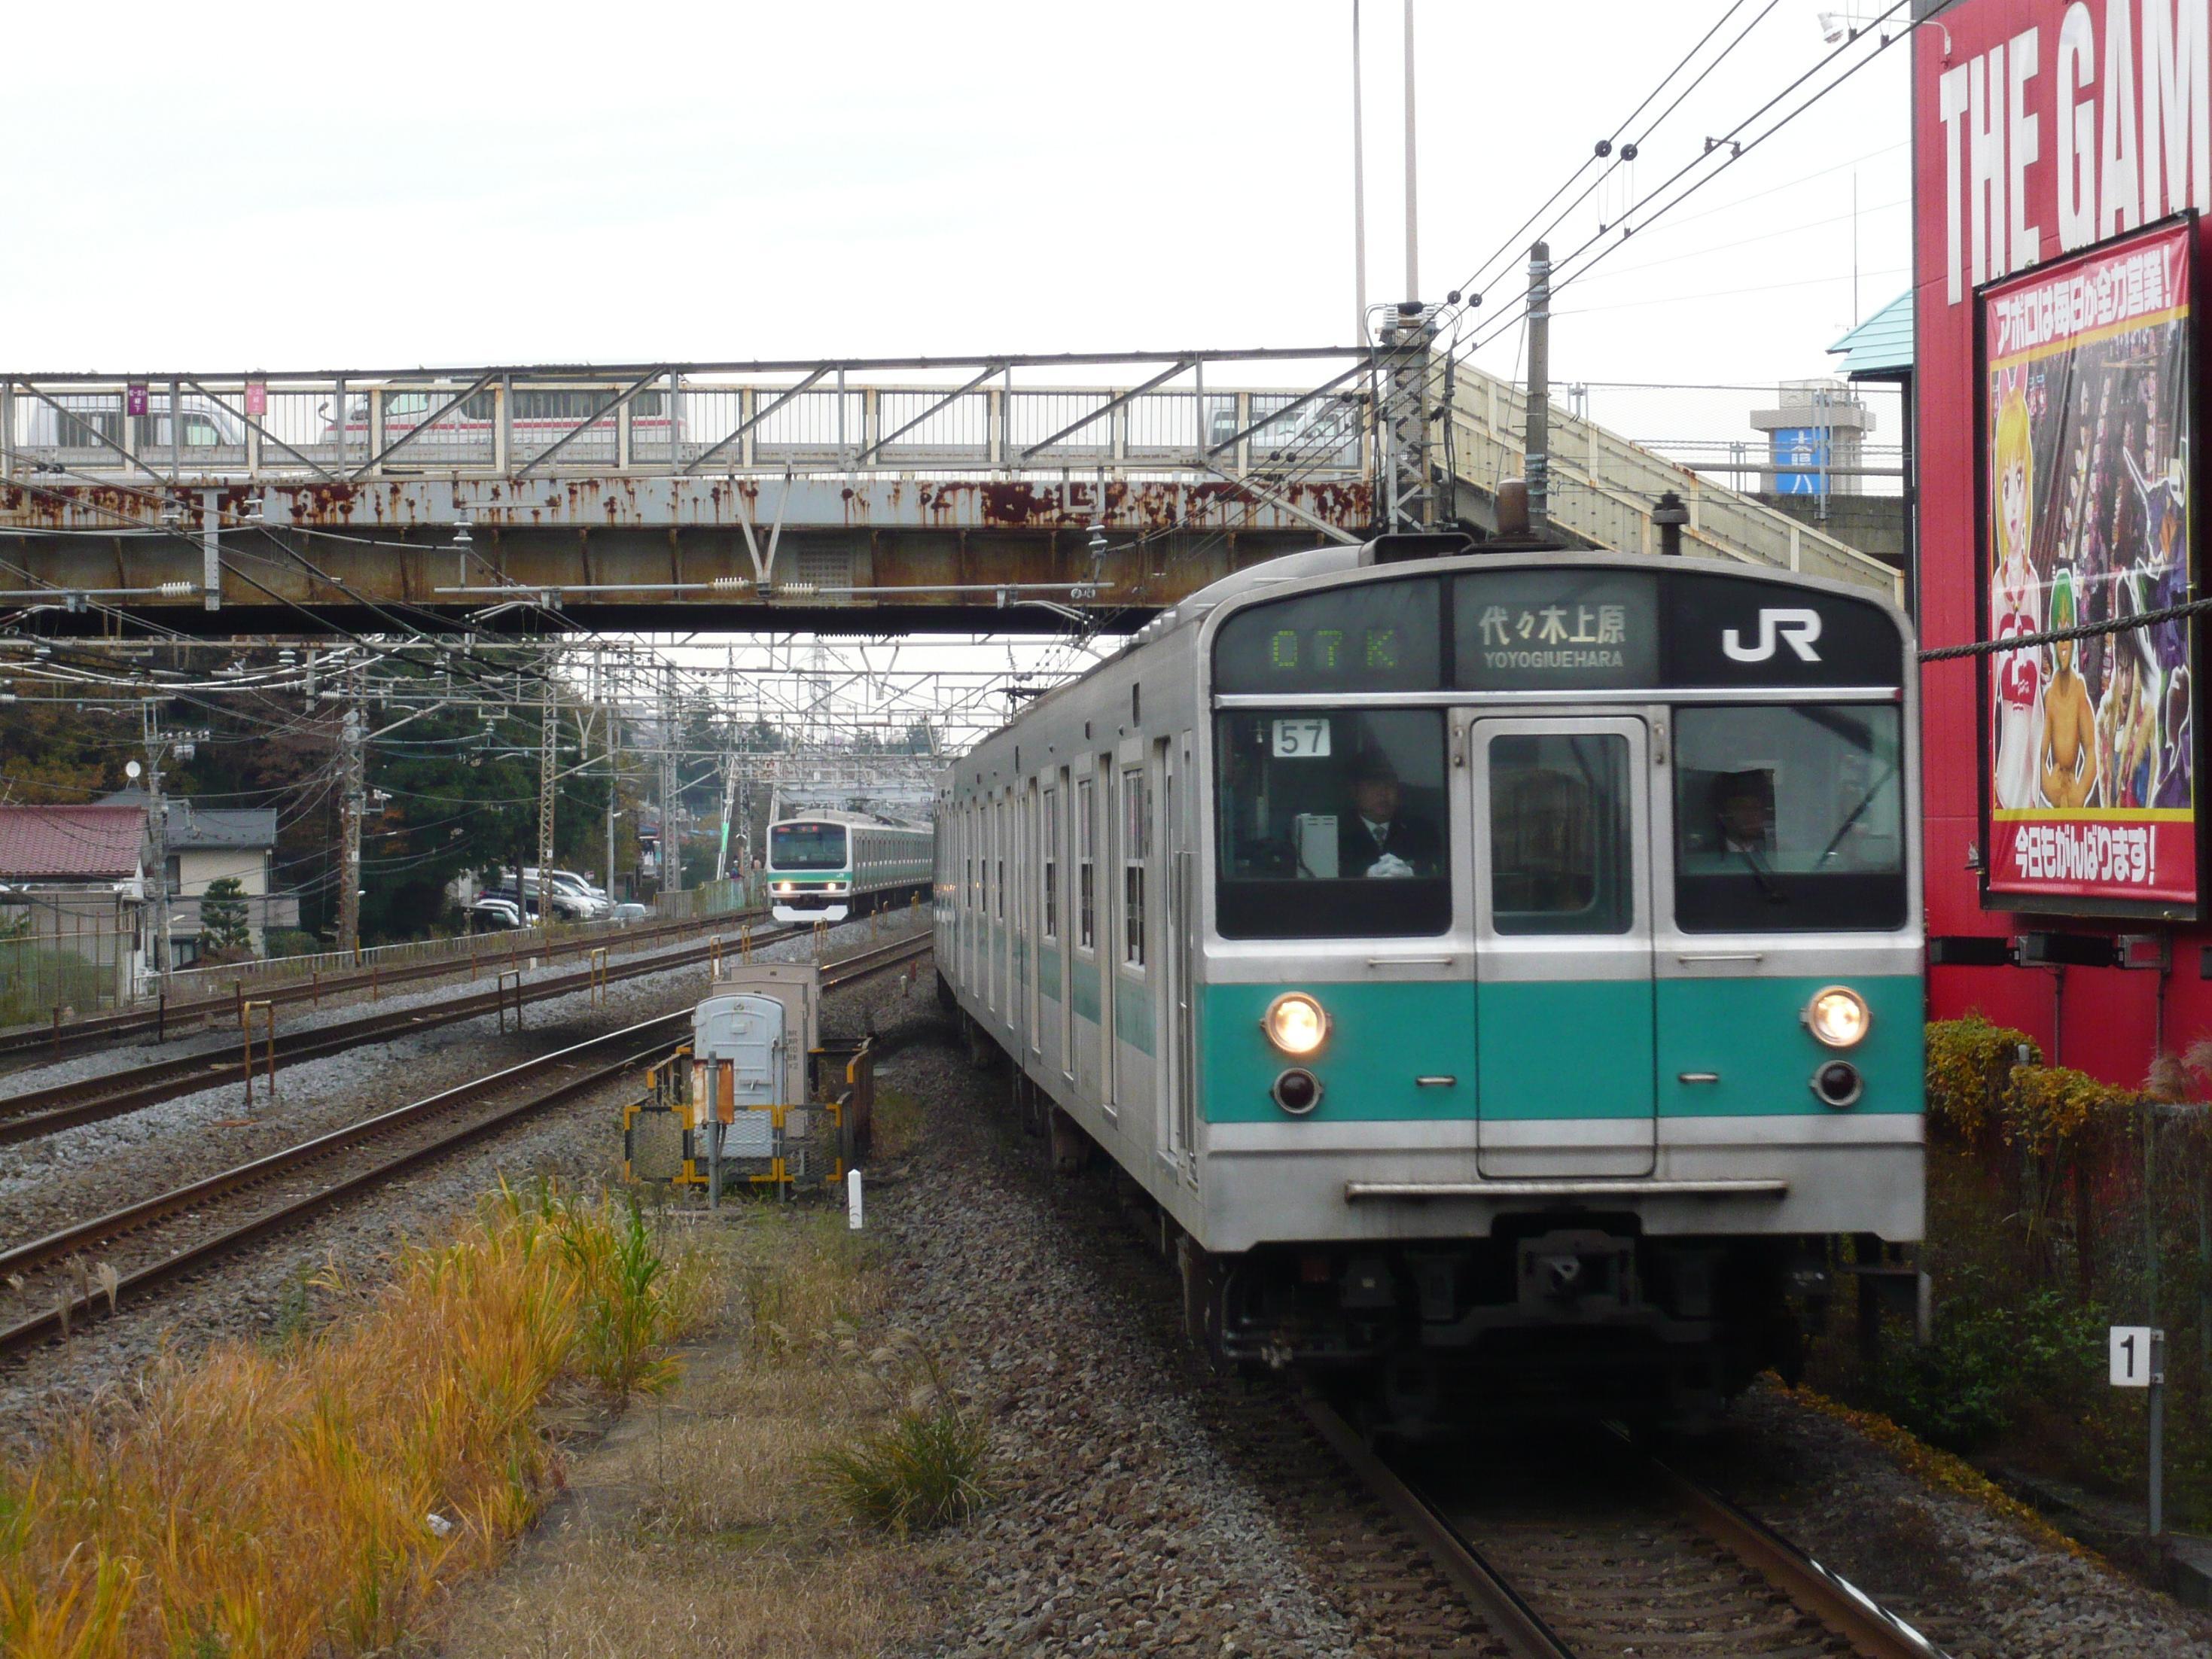 P1010765-2.JPG